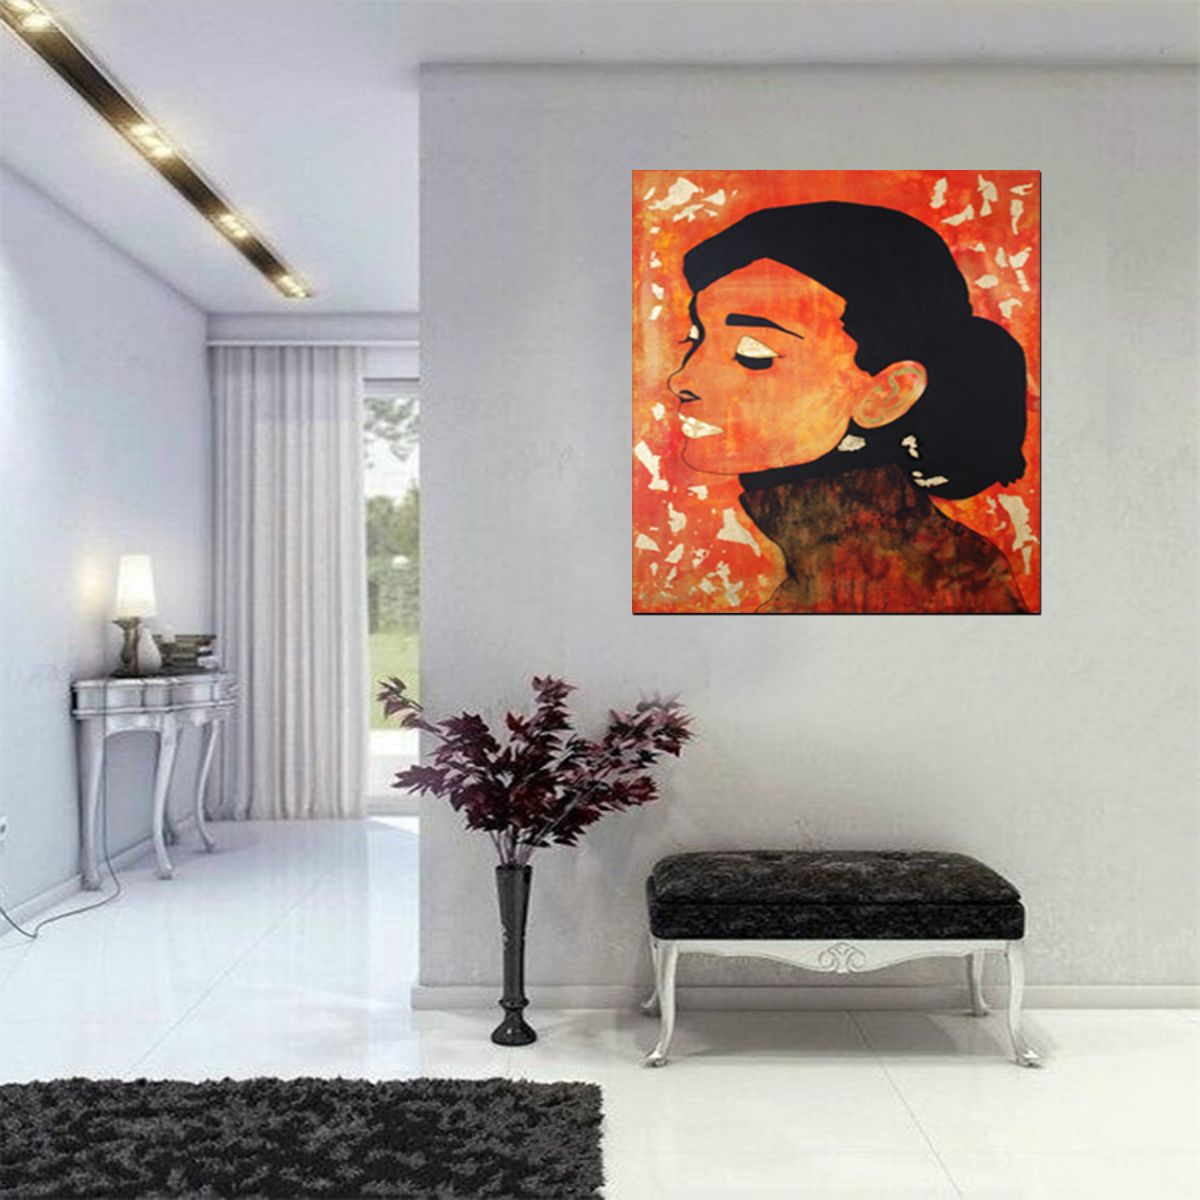 art collections original painting toile peinture. Black Bedroom Furniture Sets. Home Design Ideas